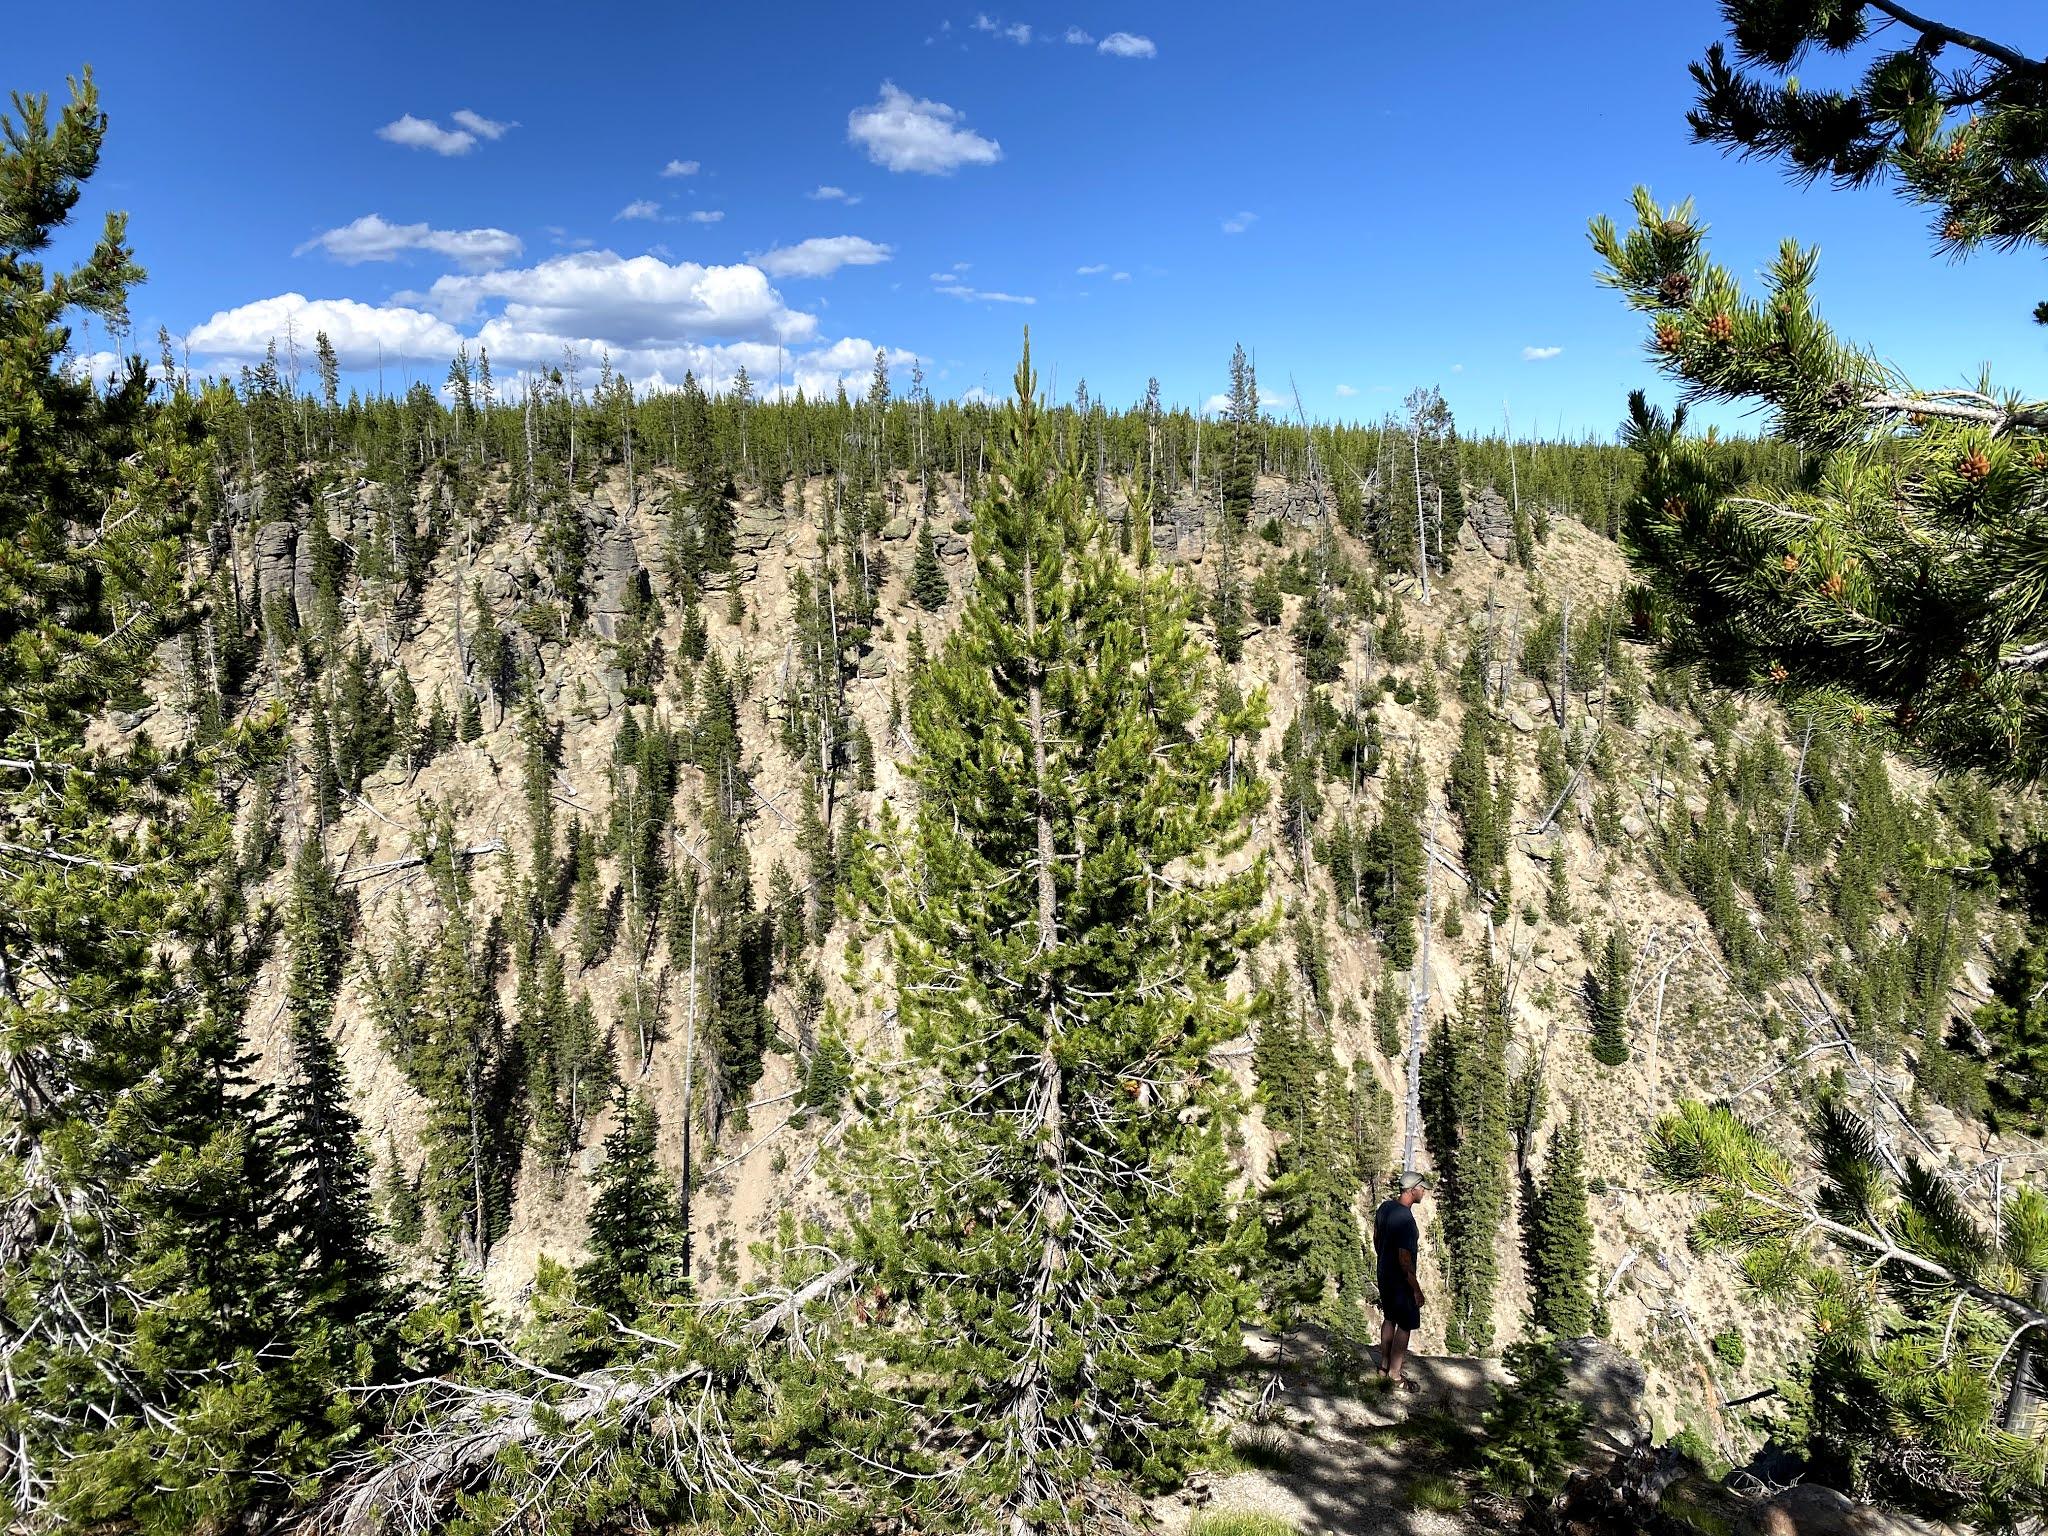 Yellowstone National Park | Biblio-style.com